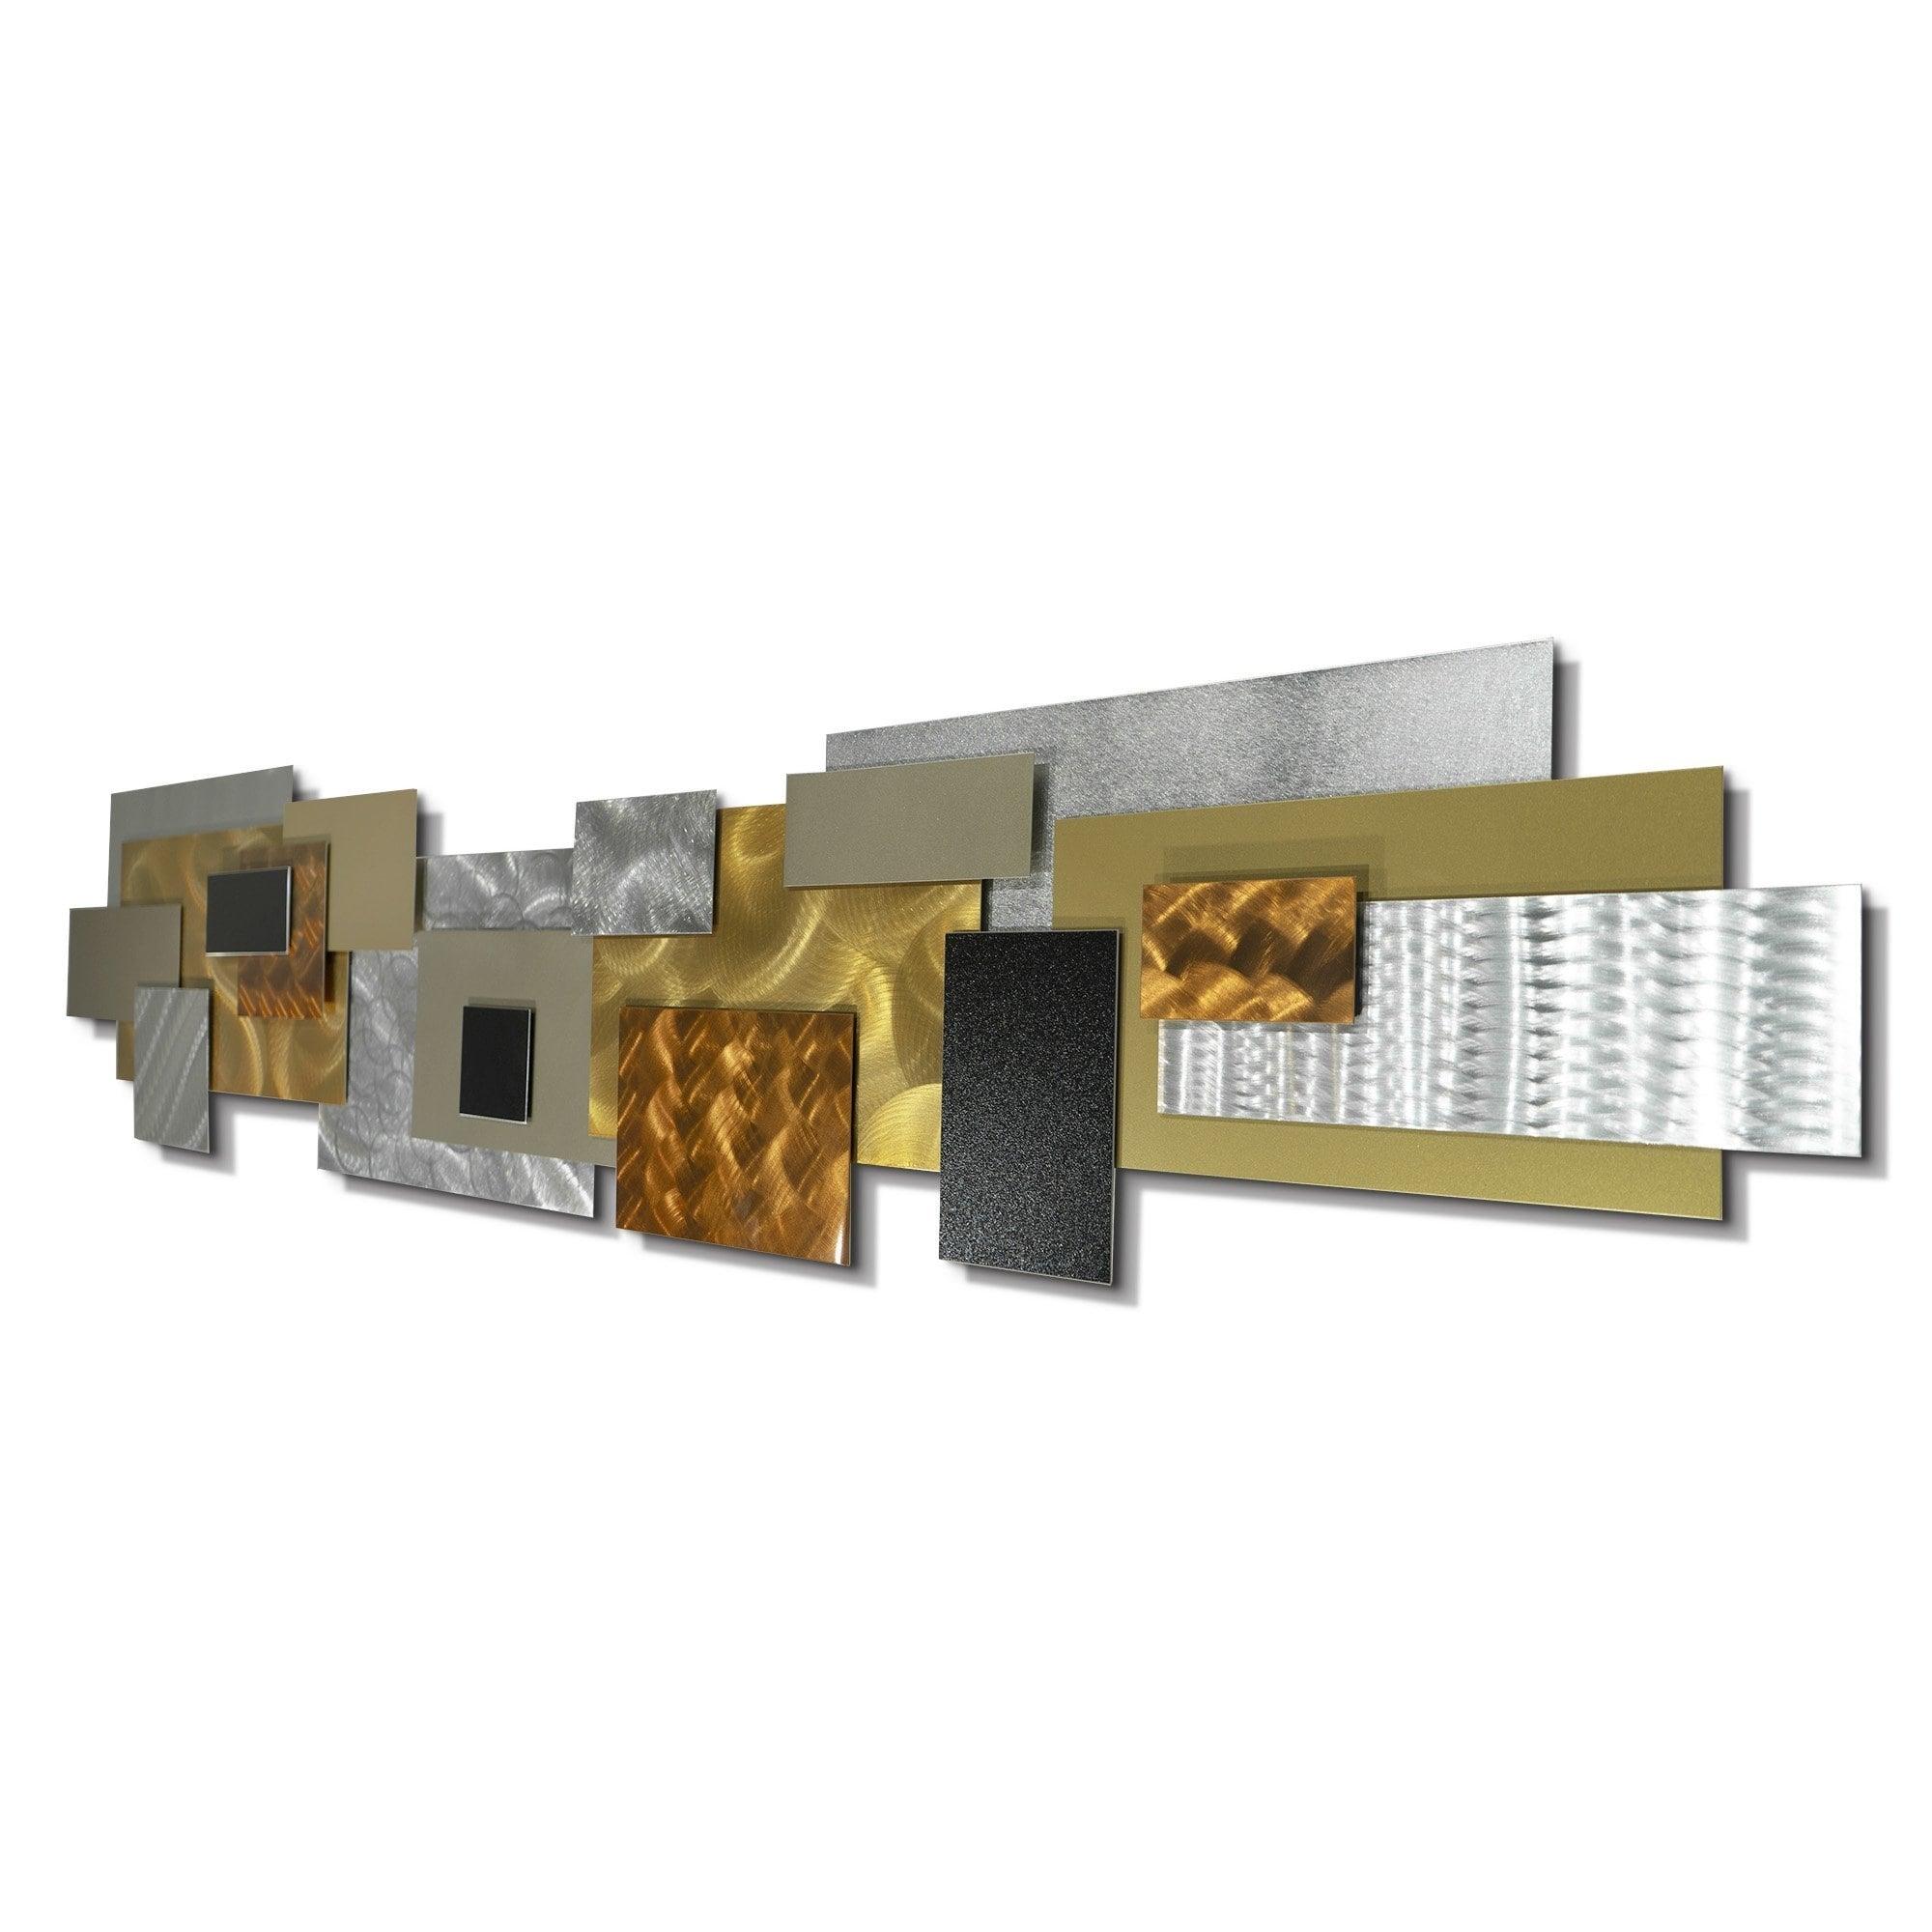 Statements2000 Extra Large Modern 3d Metal Wall Art Hanging Sculpture Jon Allen Copper Impromto Xl Overstock 28545967